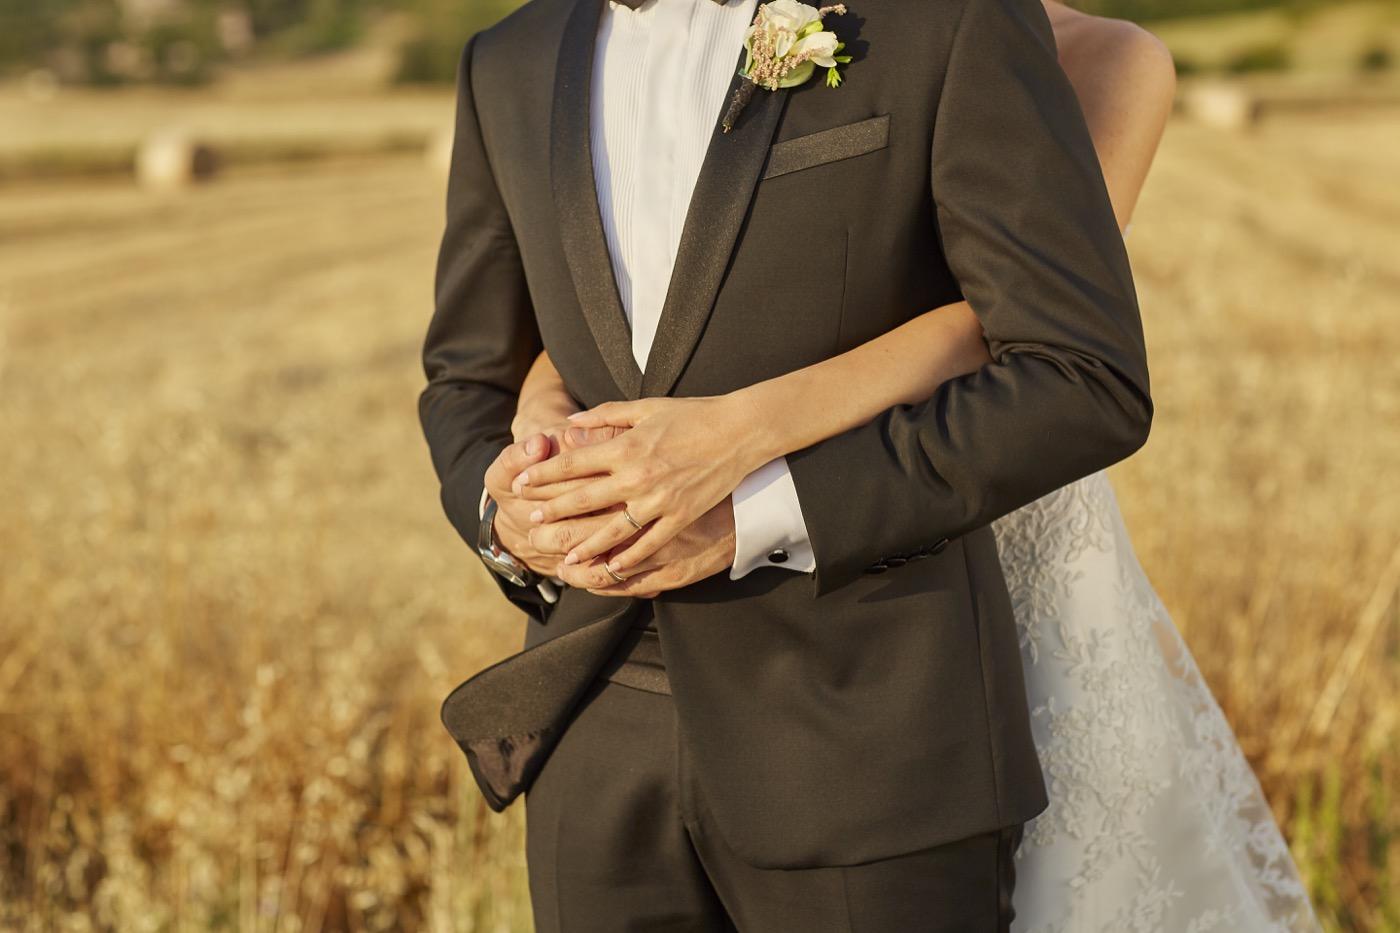 Claudio-Coppola-wedding-photographer-abbazia-7-frati-piegaro-64